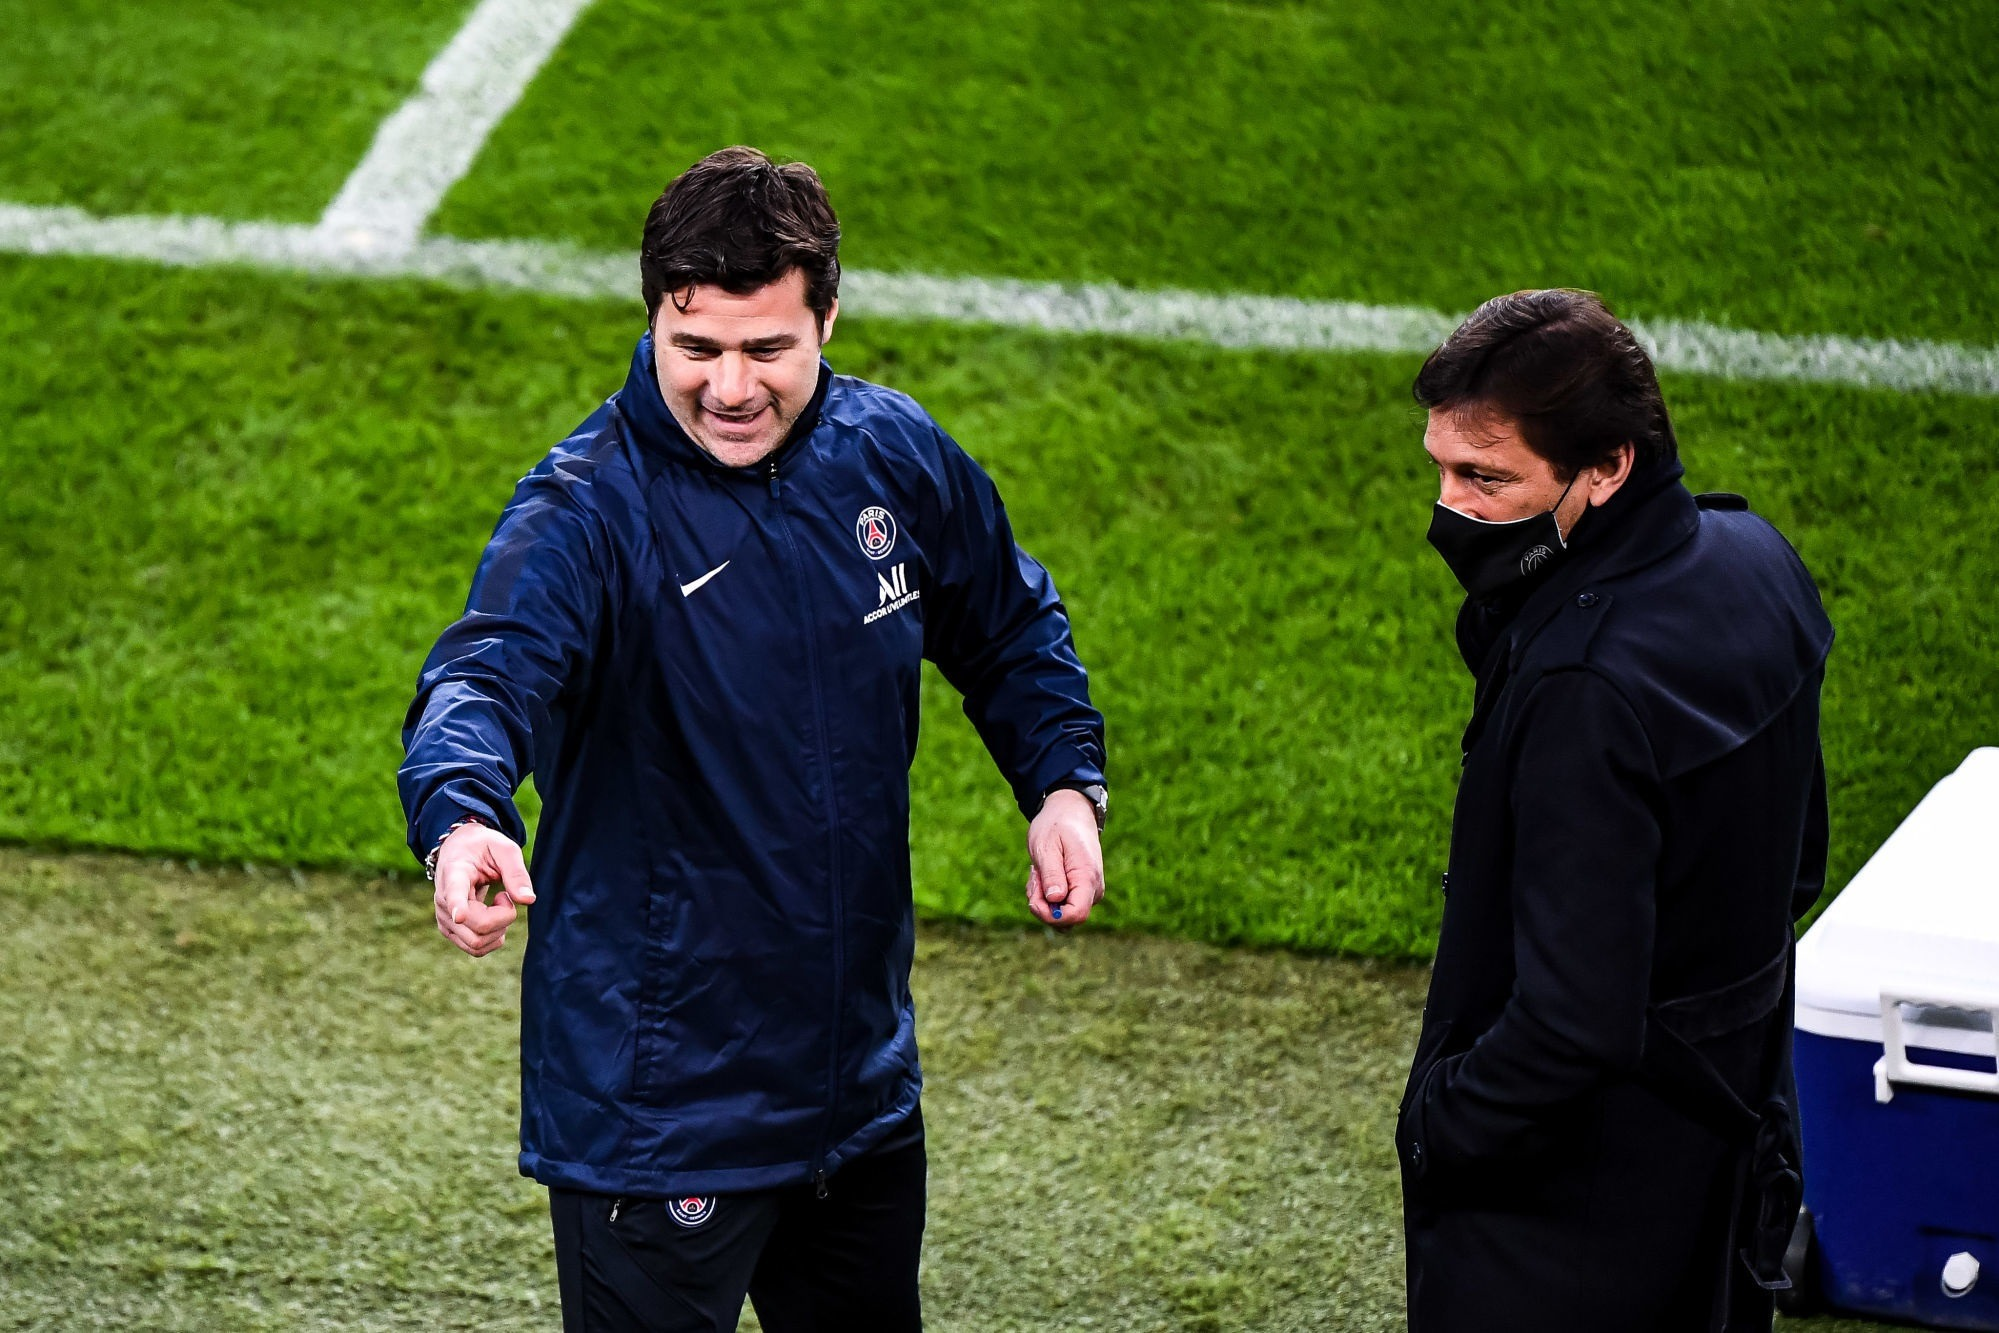 Exclu - Pochettino va rester au PSG en ayant obtenu certaines garanties